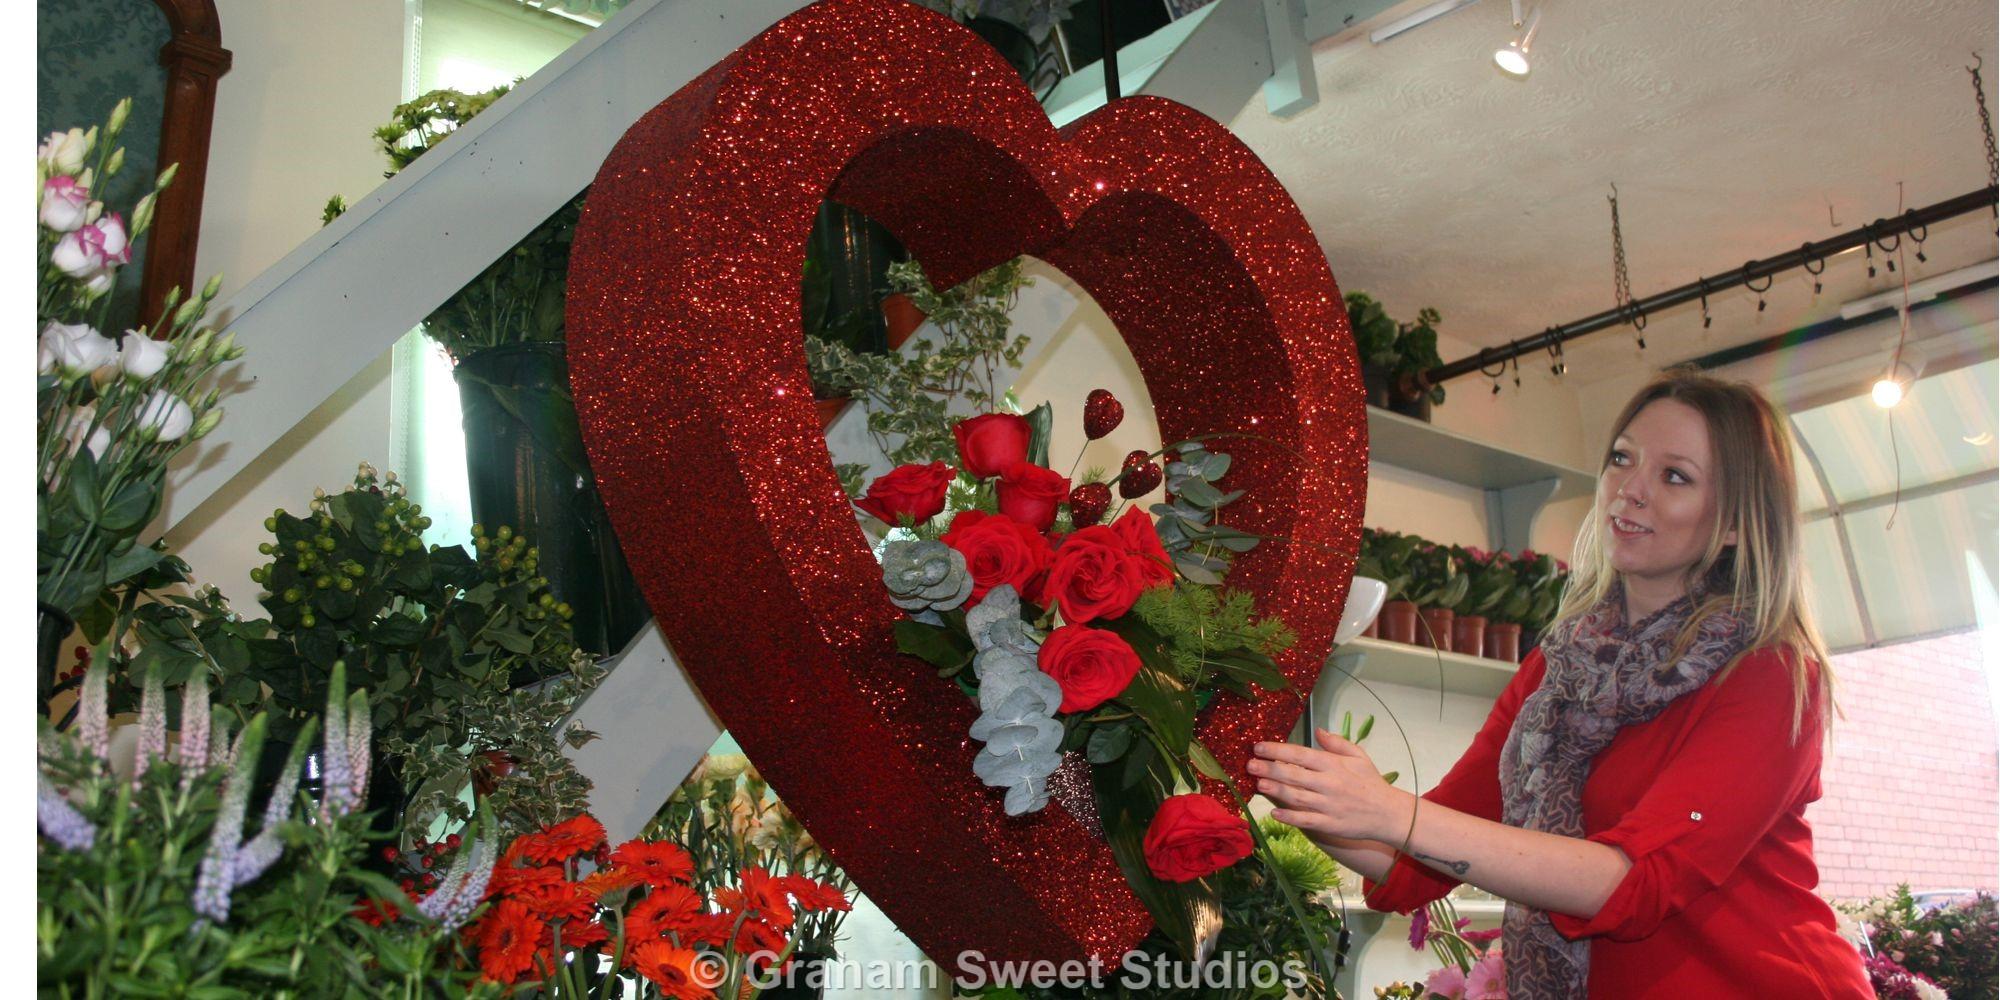 Valentines Fluffy Slime Recipe!  The Imagination Tree